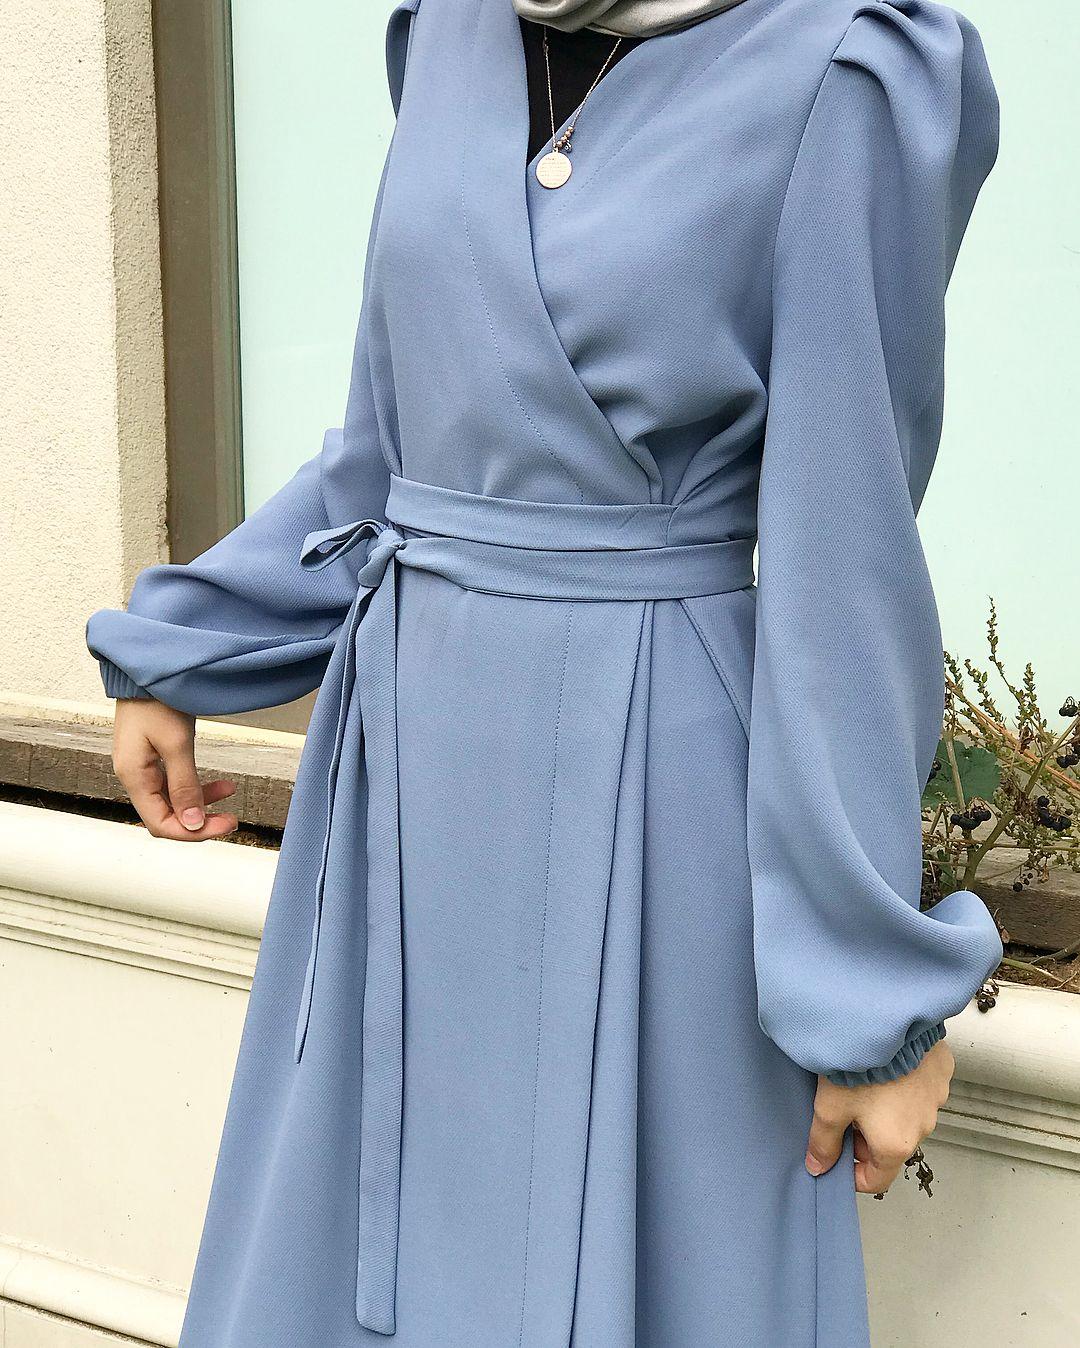 Kruvaze Yaka Elbise Details Ayrintilar Kruvaze Yaka Prenses Pileli Kol Belden Kusakli Beden 34 46 Bed Hijab Fashion Muslim Fashion Dress Hijab Fashionista